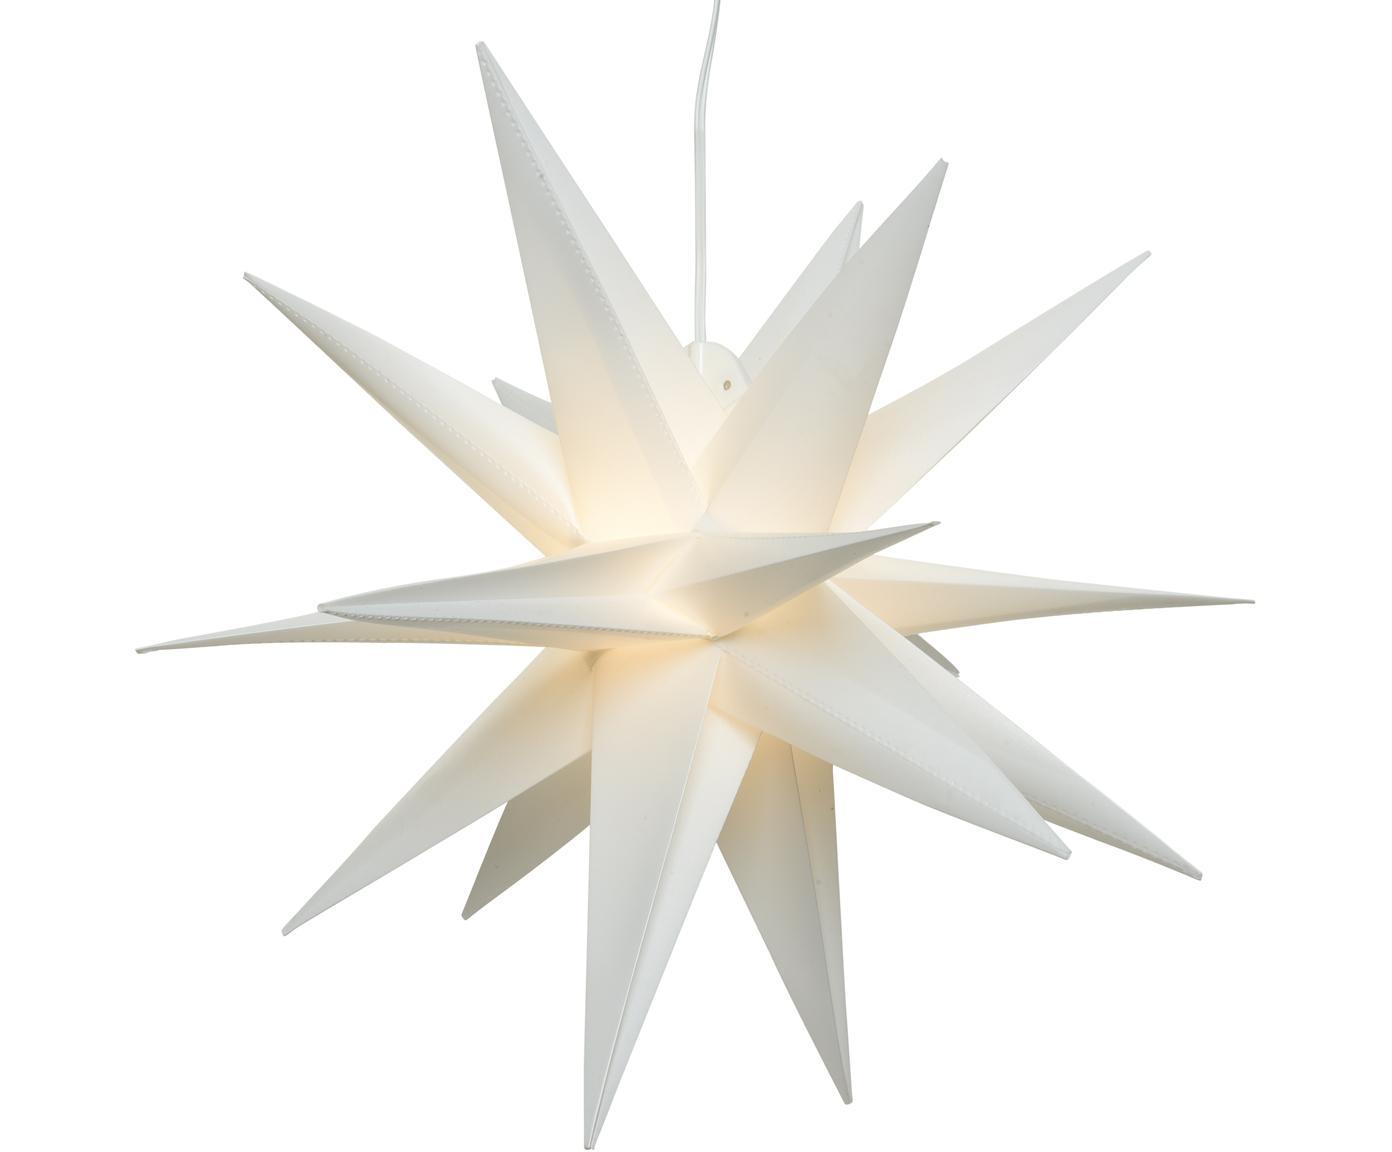 Batterij-aangedreven LED lichtster Zing, Wit, Ø 30 cm